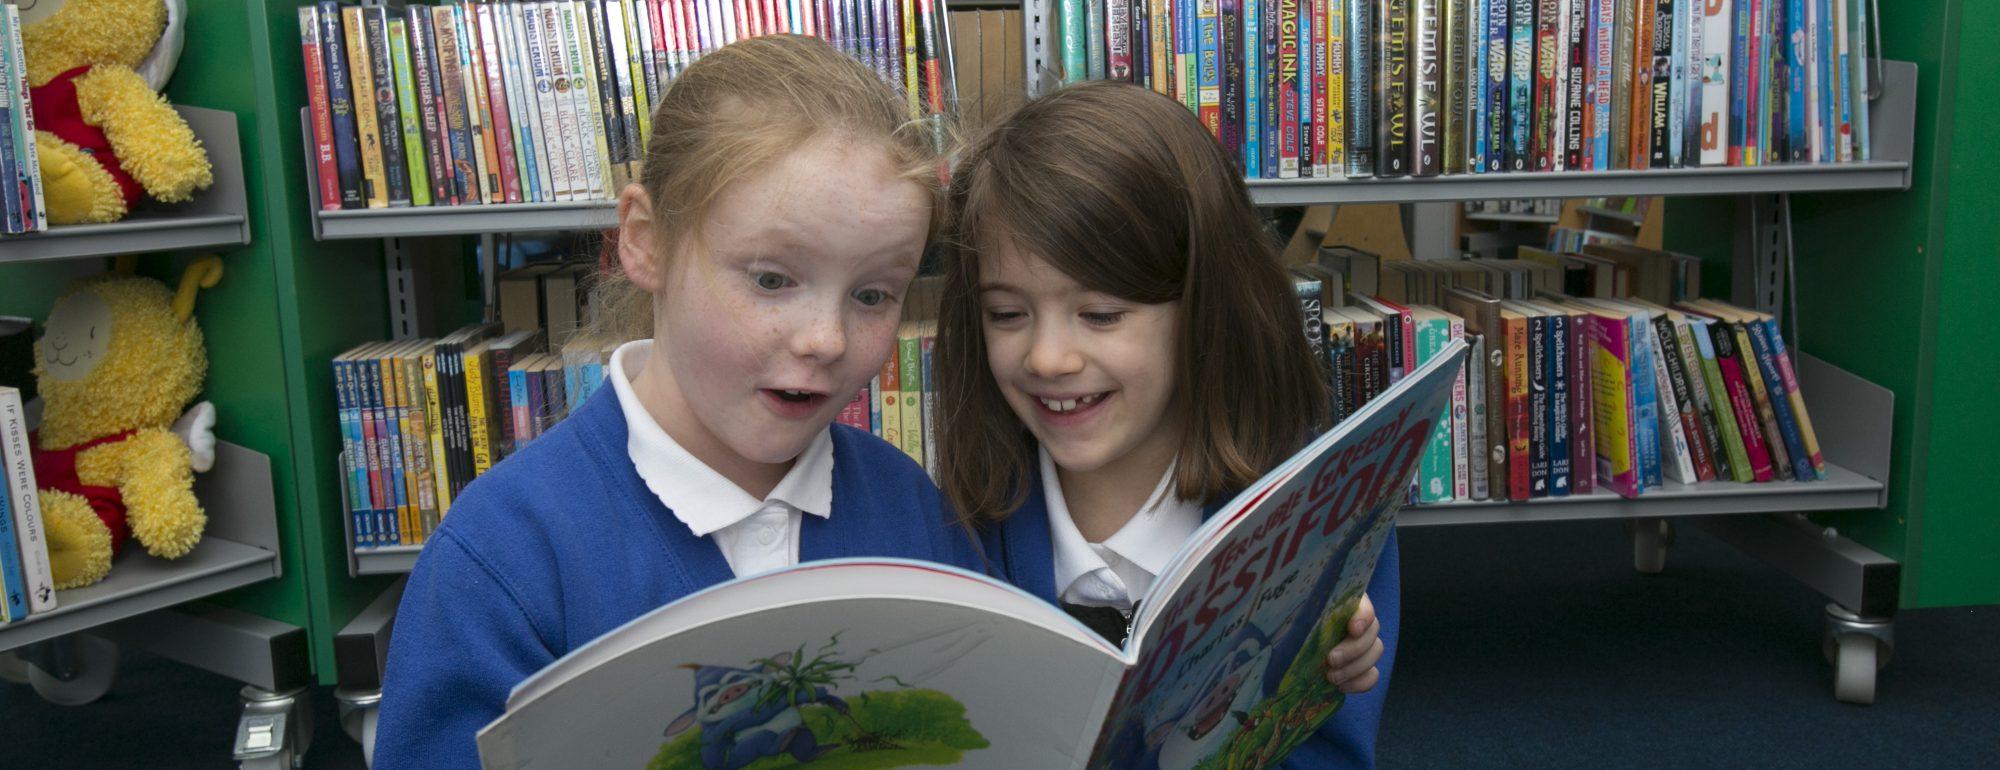 libraries-header